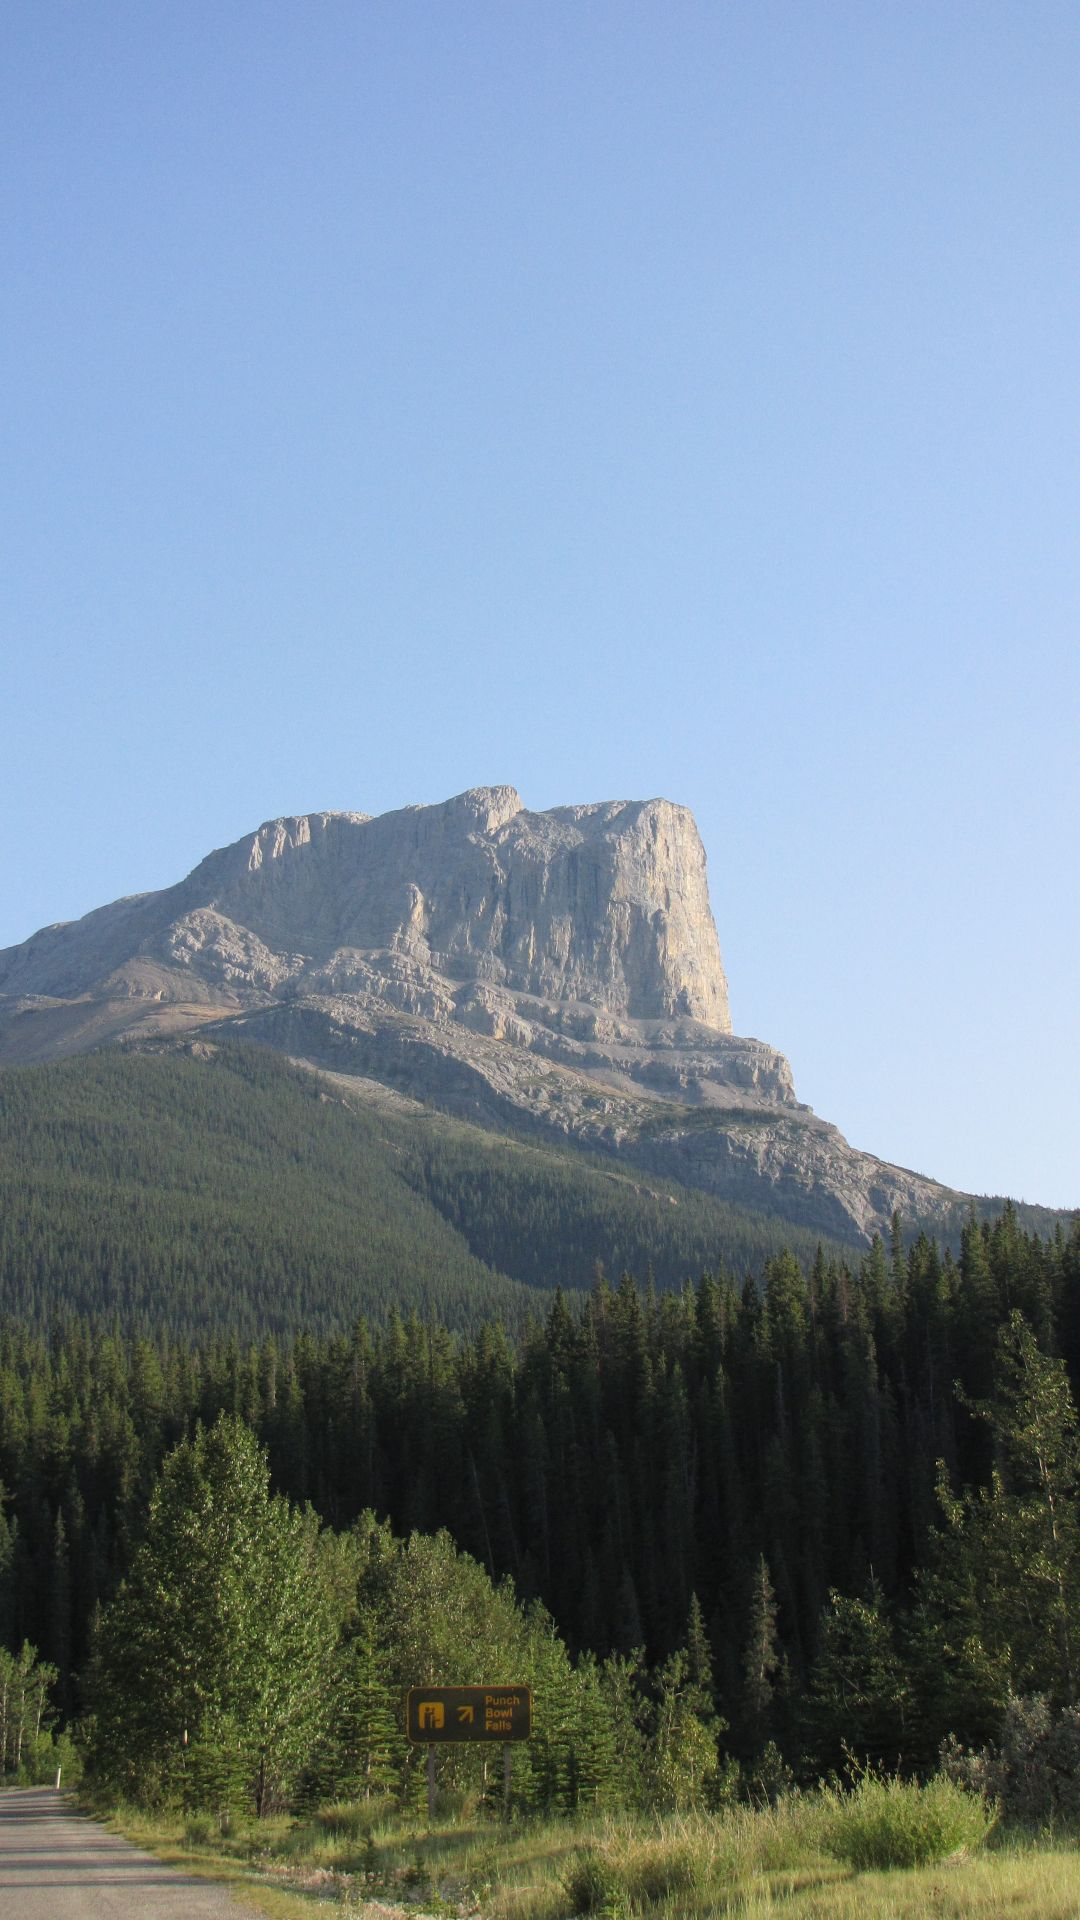 Nr Jasper, Alberta, Canada - Sooo priddy